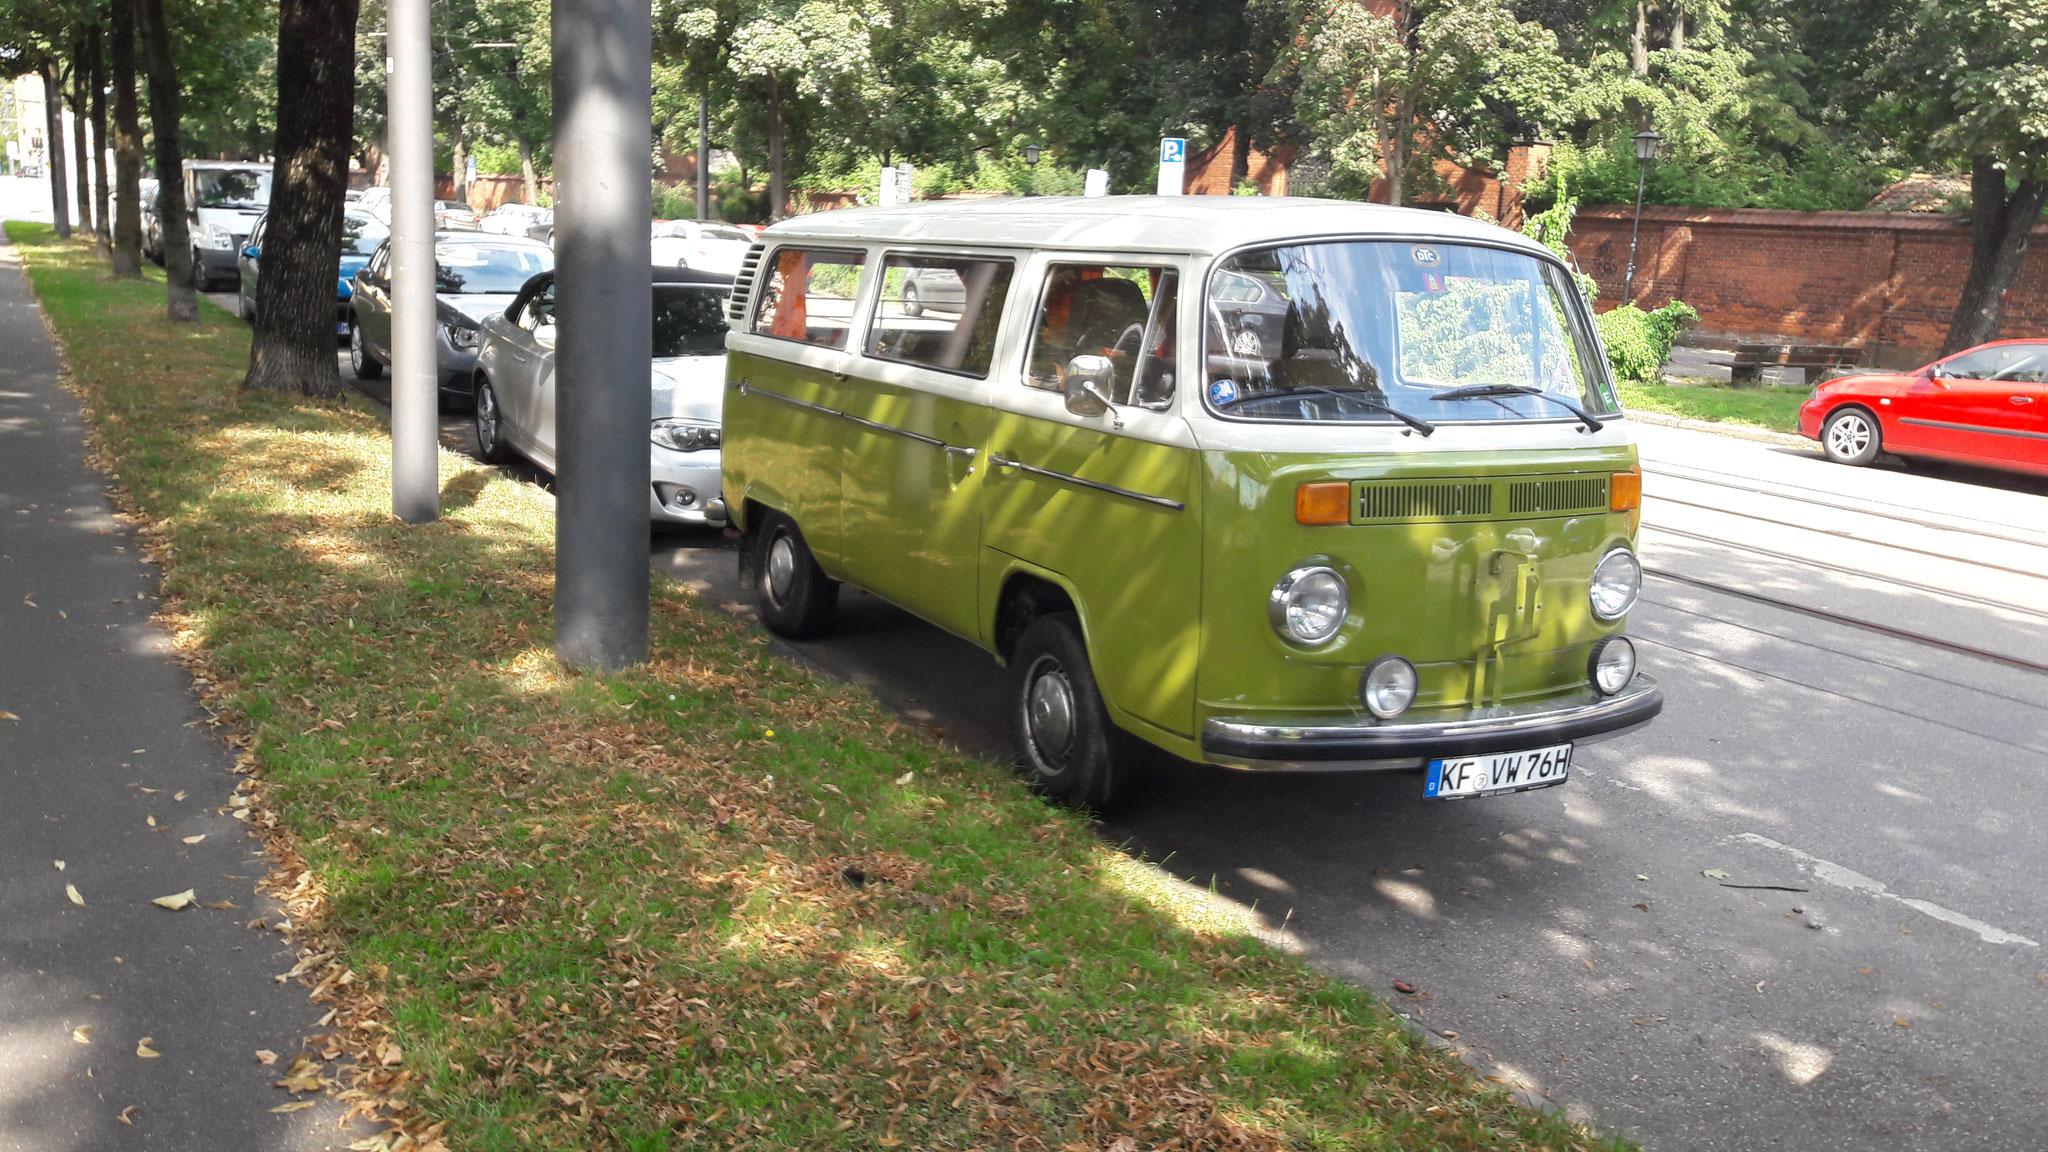 VW T2 - KF-VW-76H